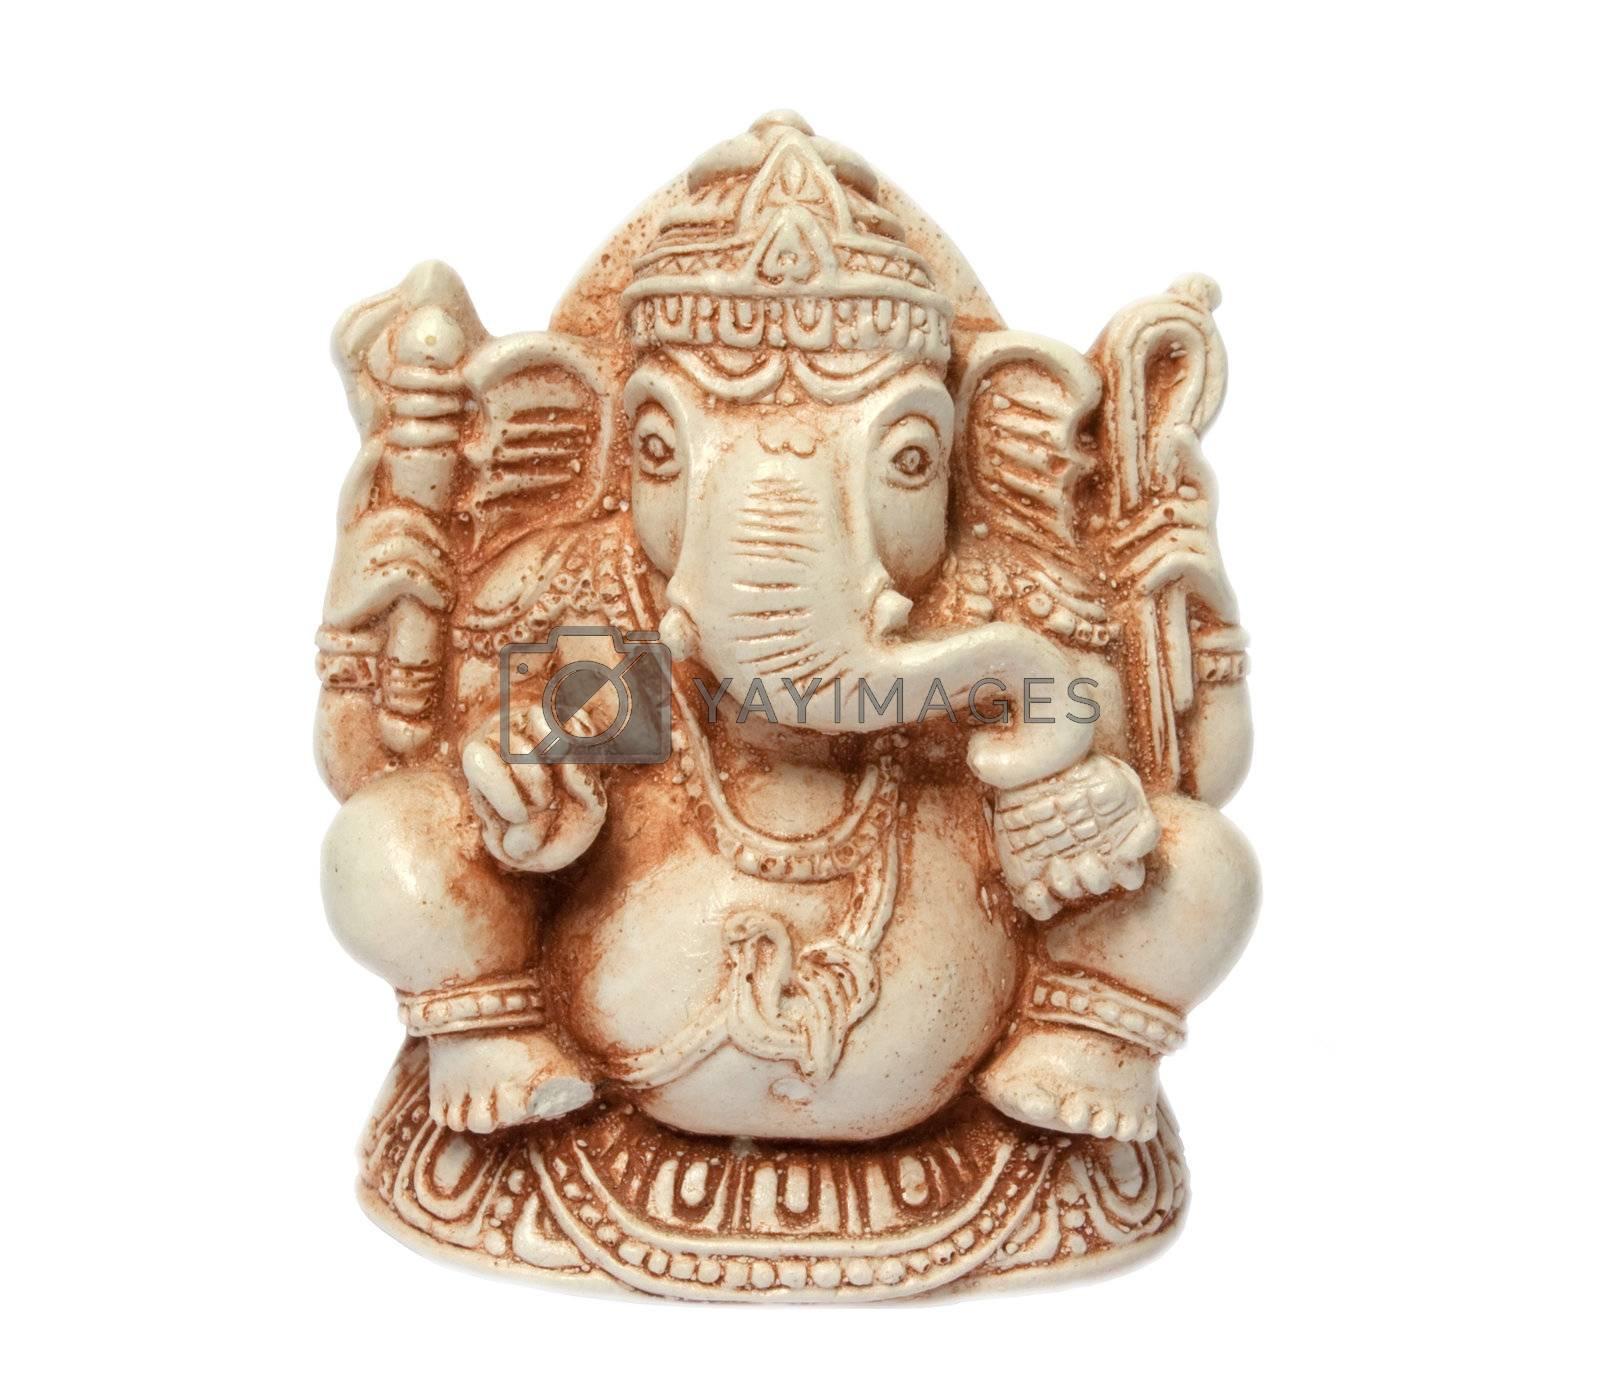 Statuette of hinduizm deity Ganesha